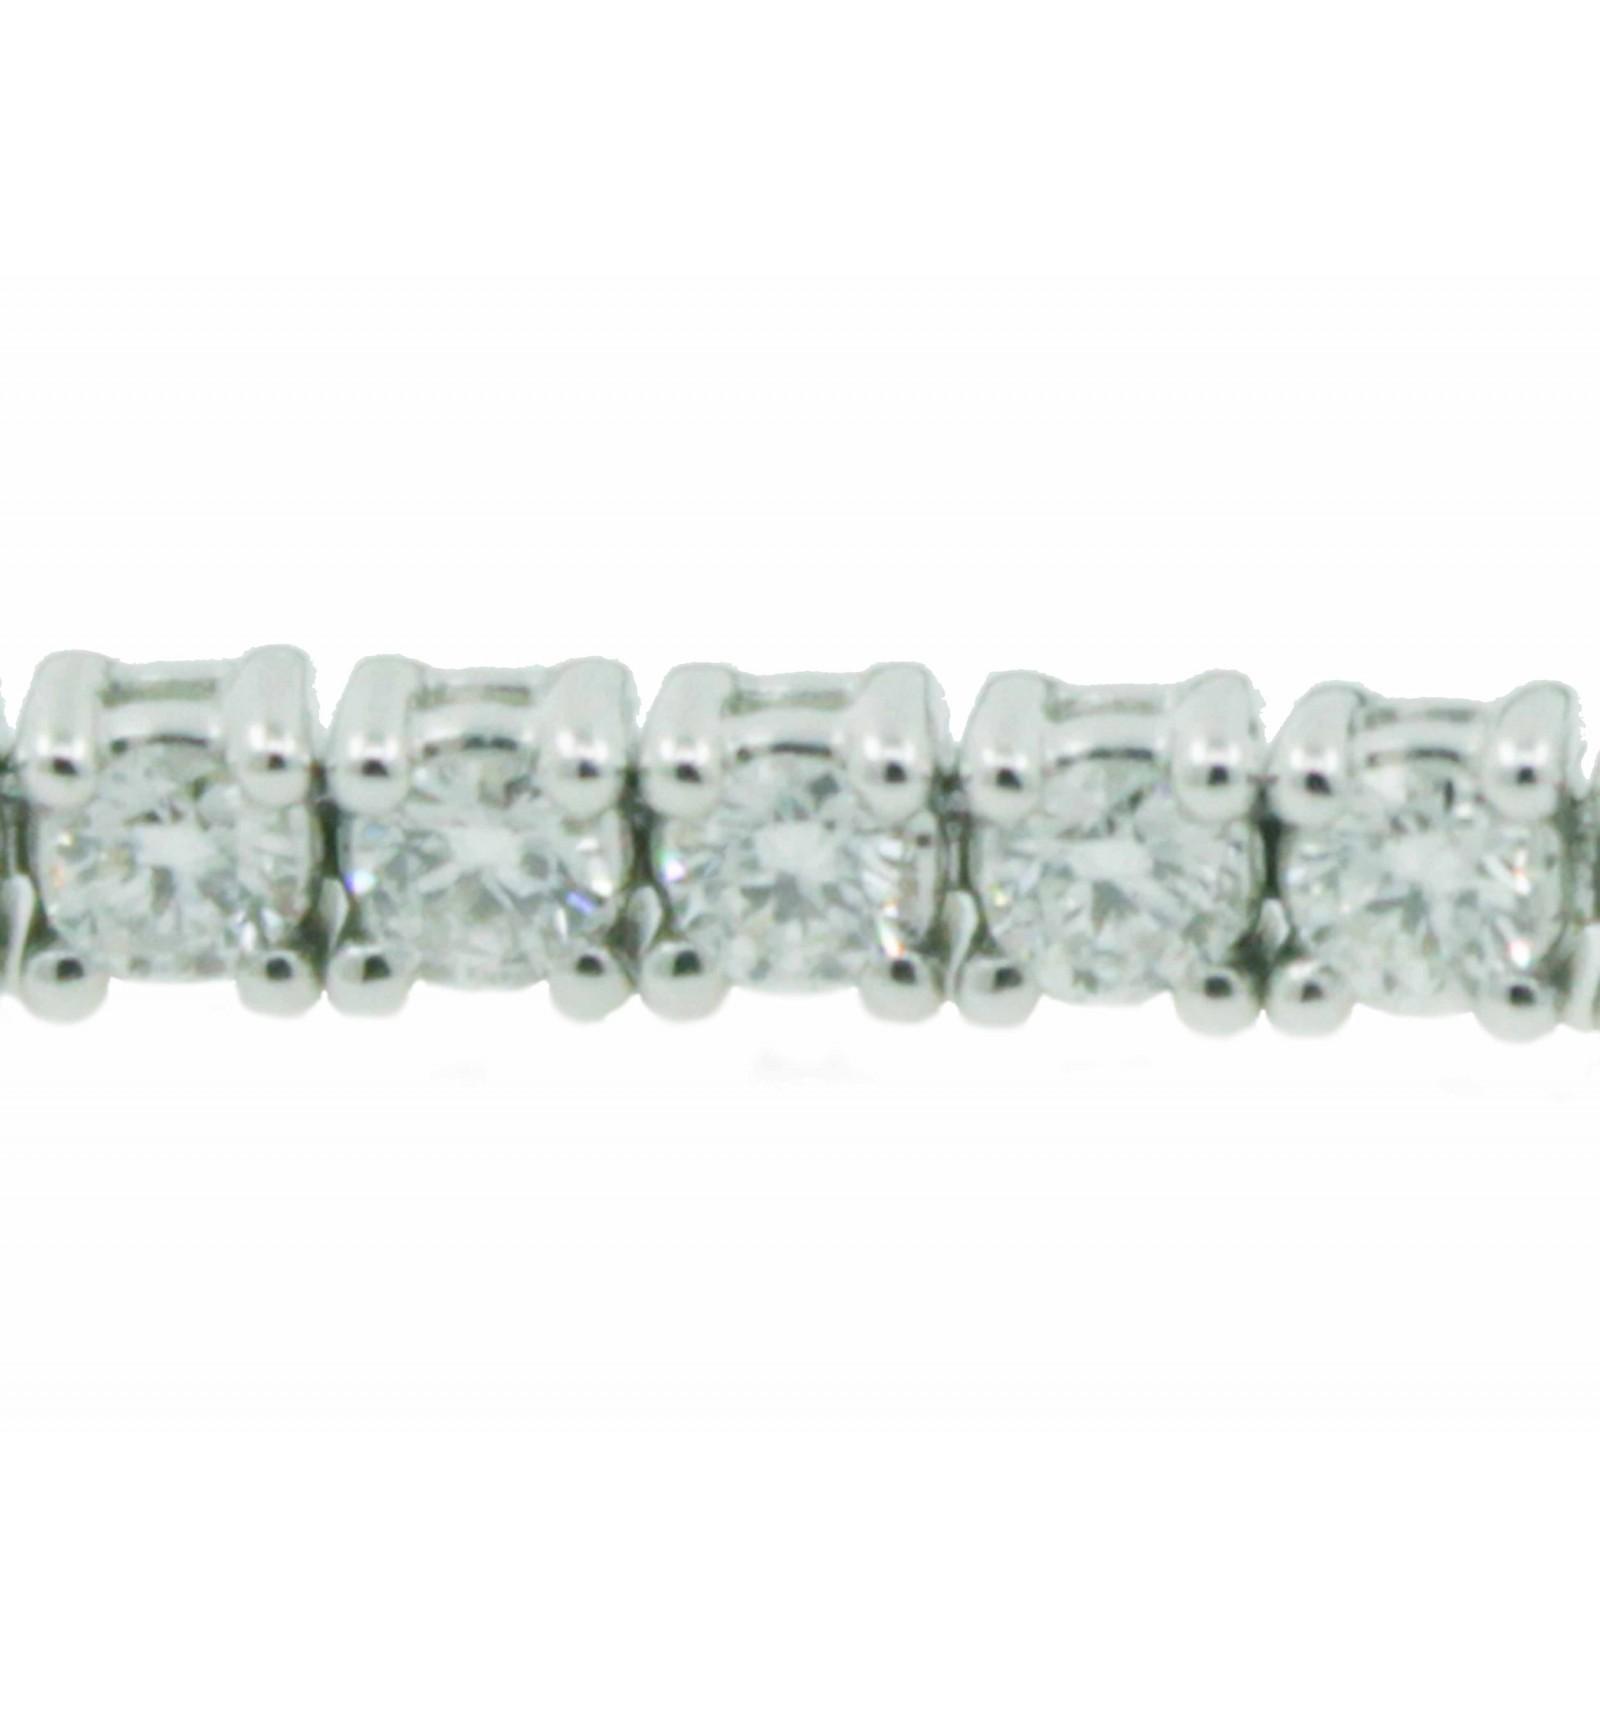 d2b176a12cb4 Pulsera de oro blanco (18K) con diamante - Lopez Joyeros